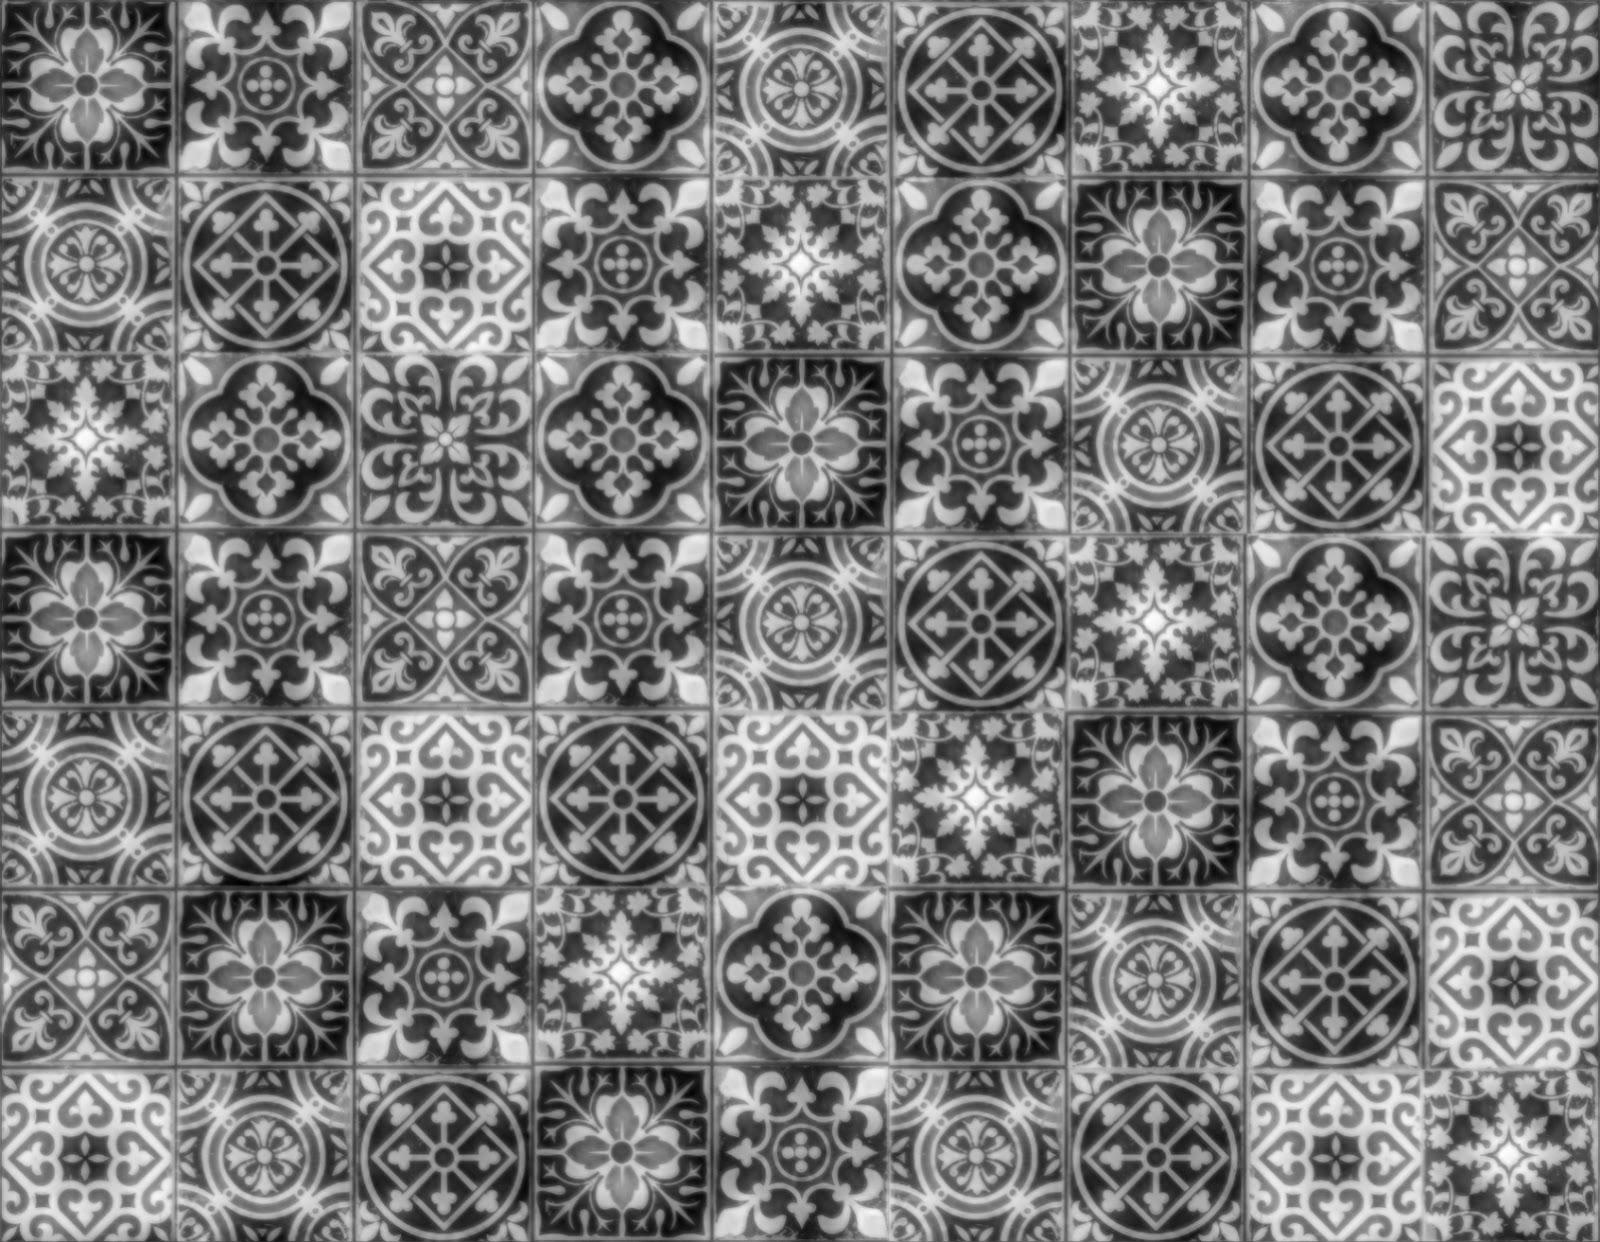 Seamless Patchwork Tiles Texture